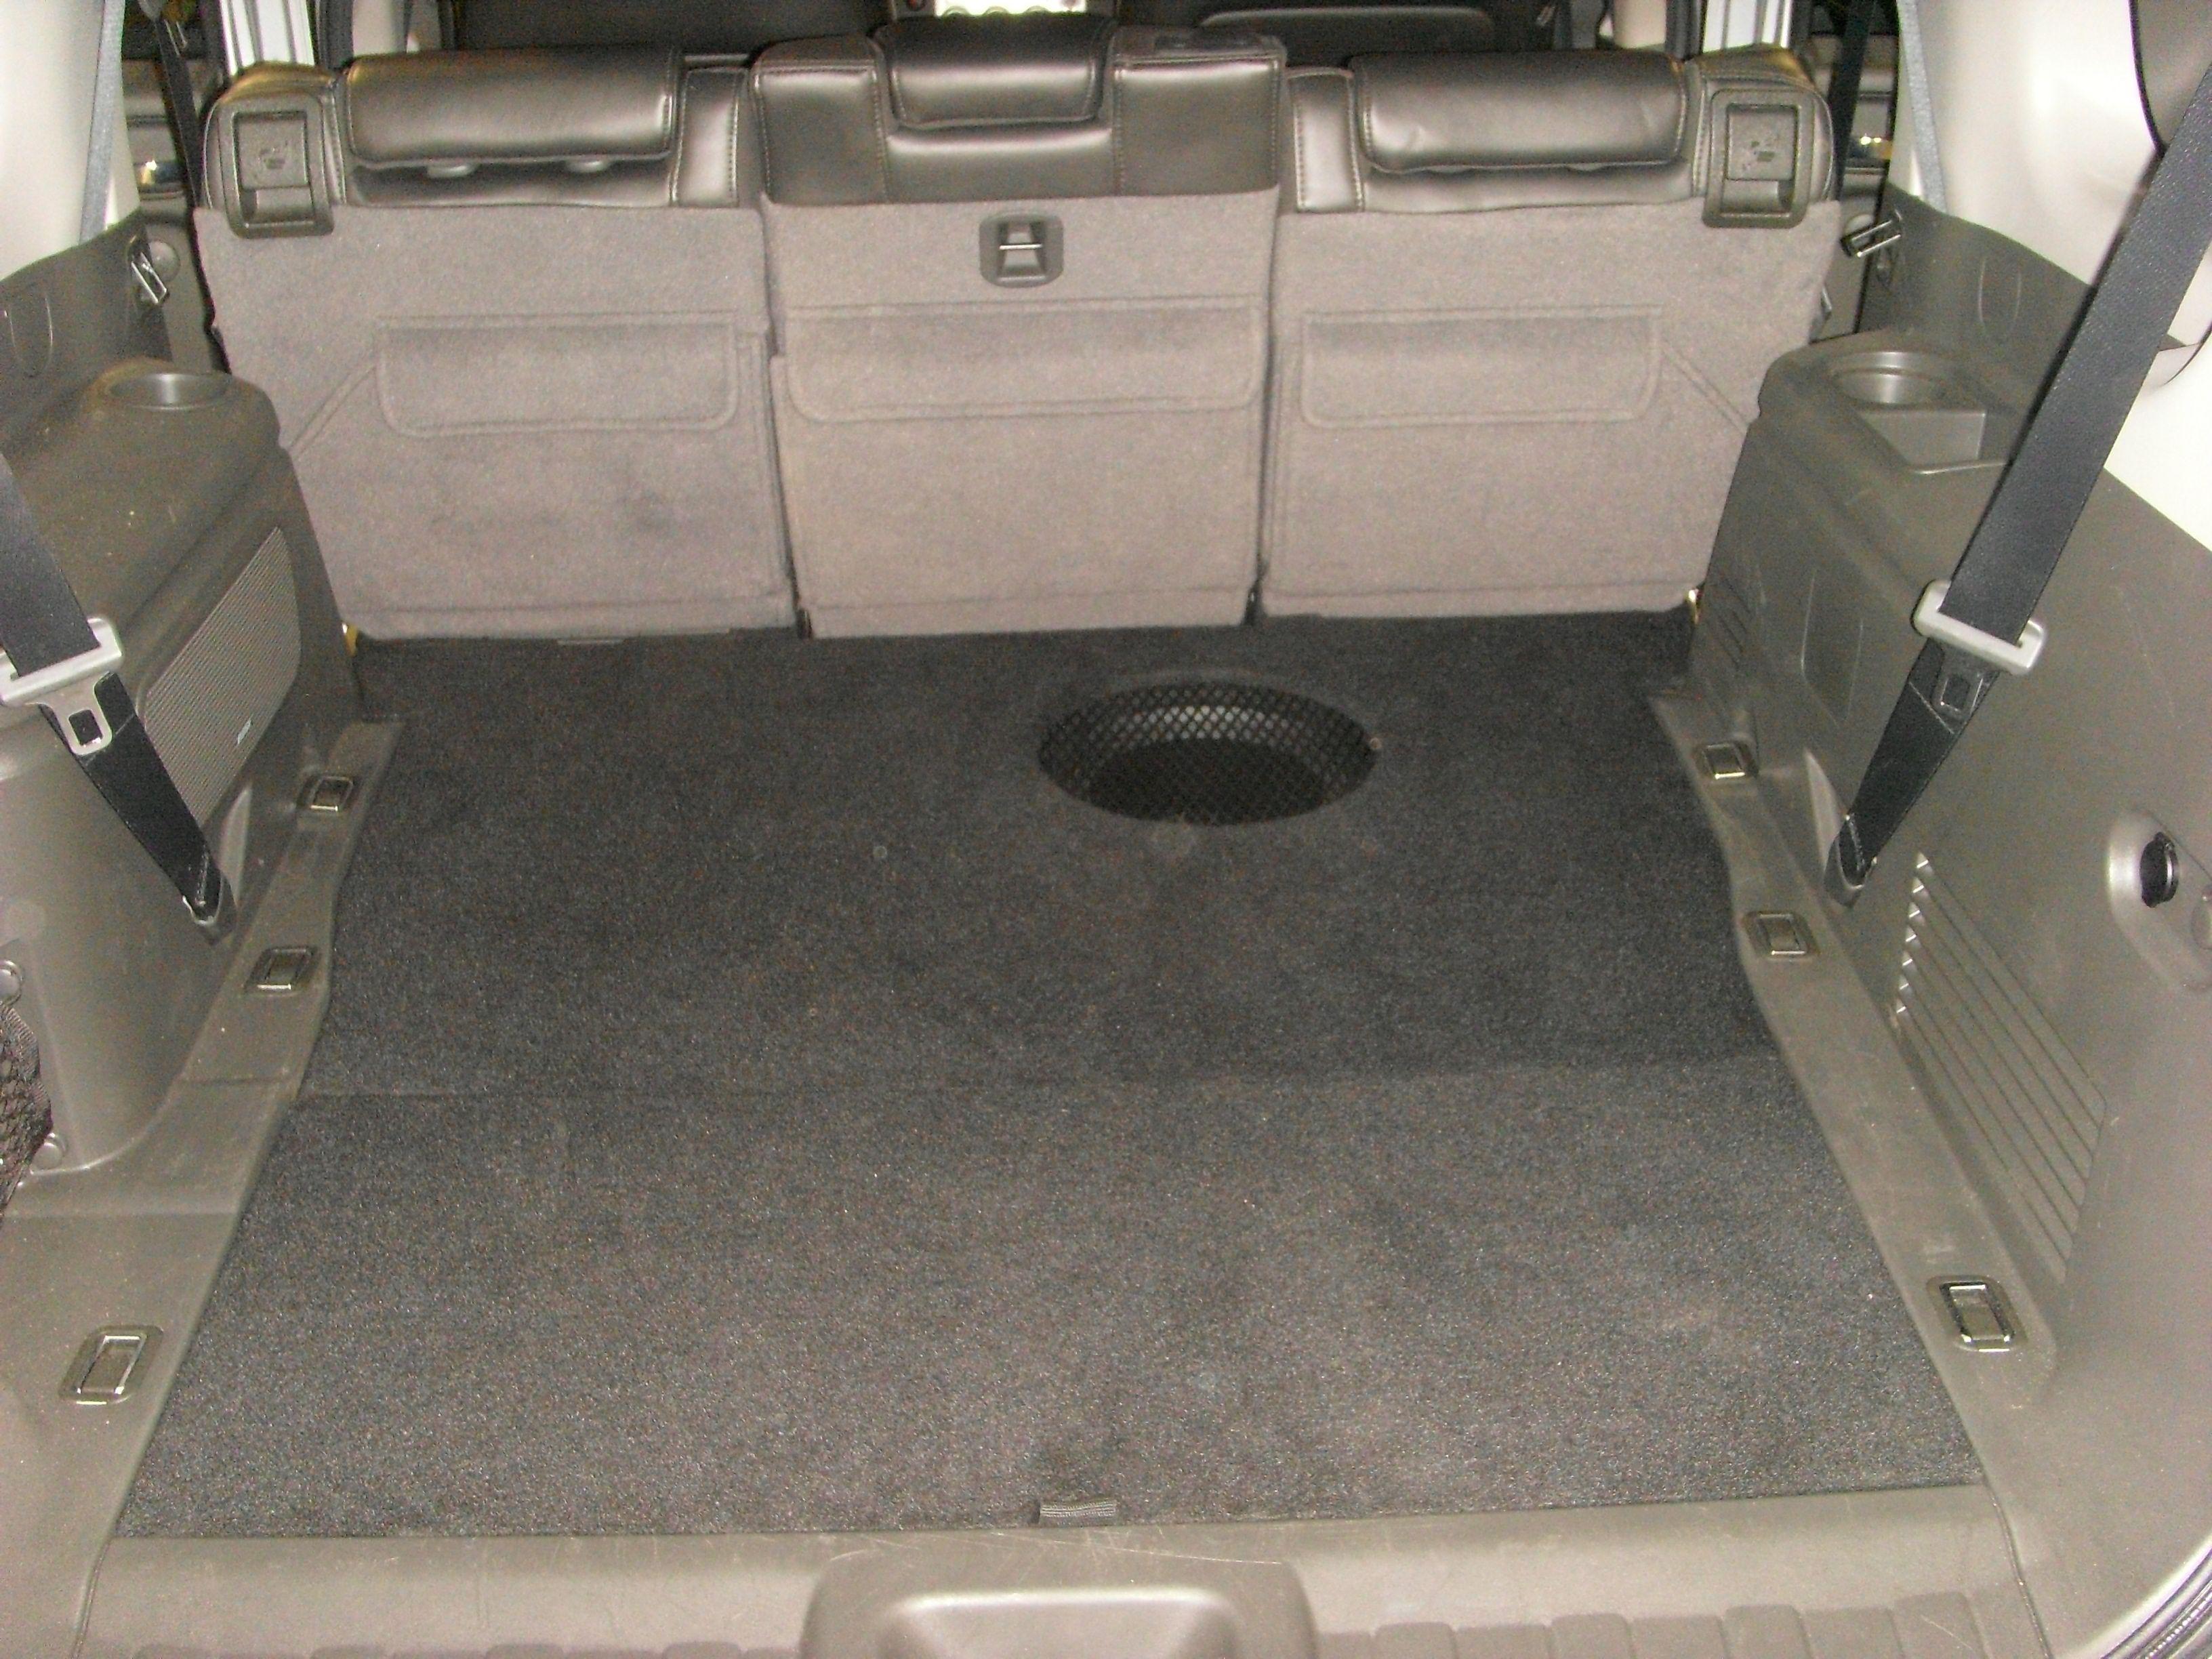 Pathfinder False Floor And Subwoofer Car Audio Installation Car